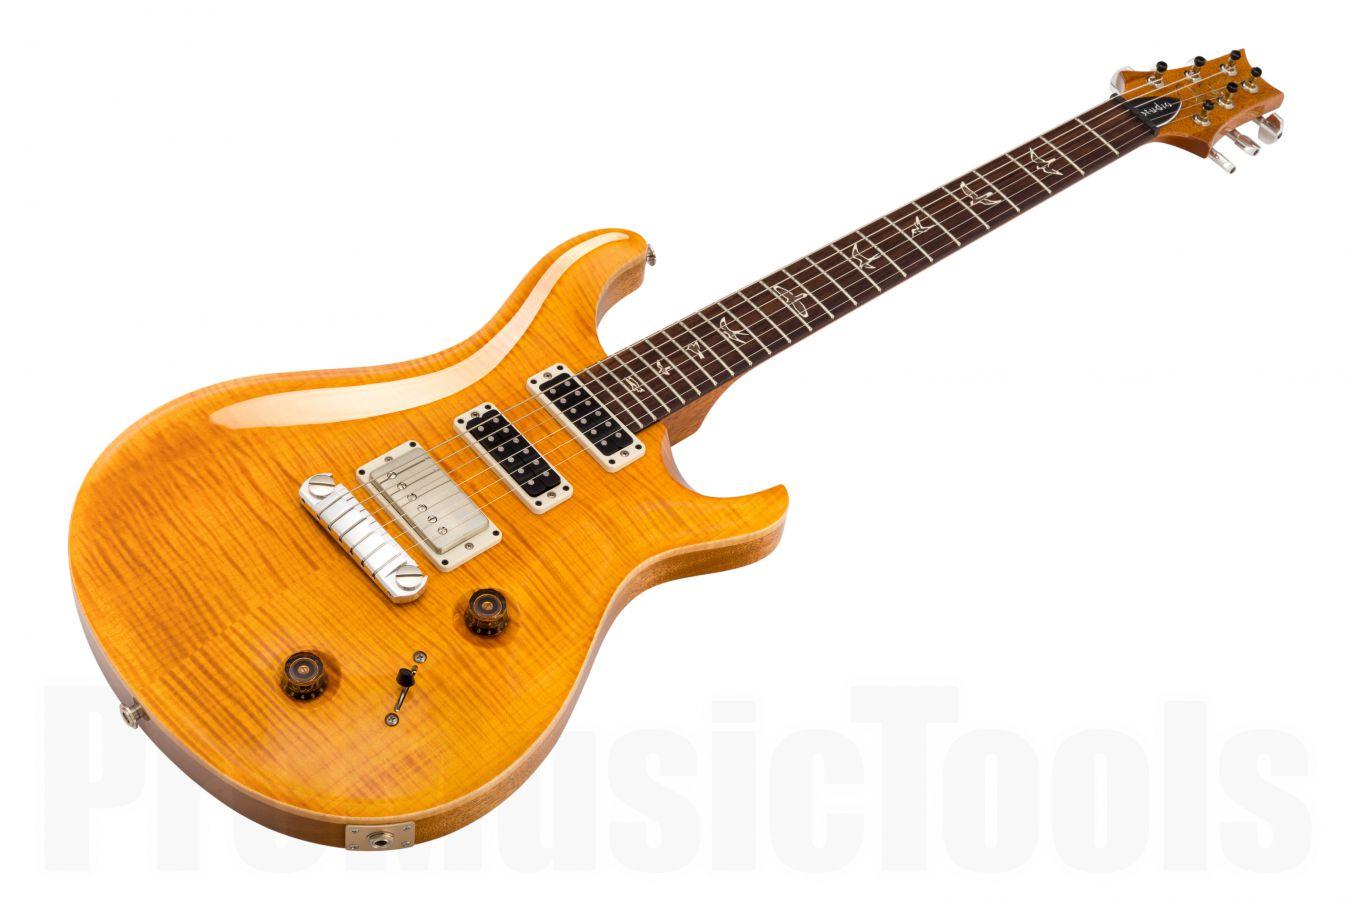 PRS USA Studio Stoptail SY - Santana Yellow